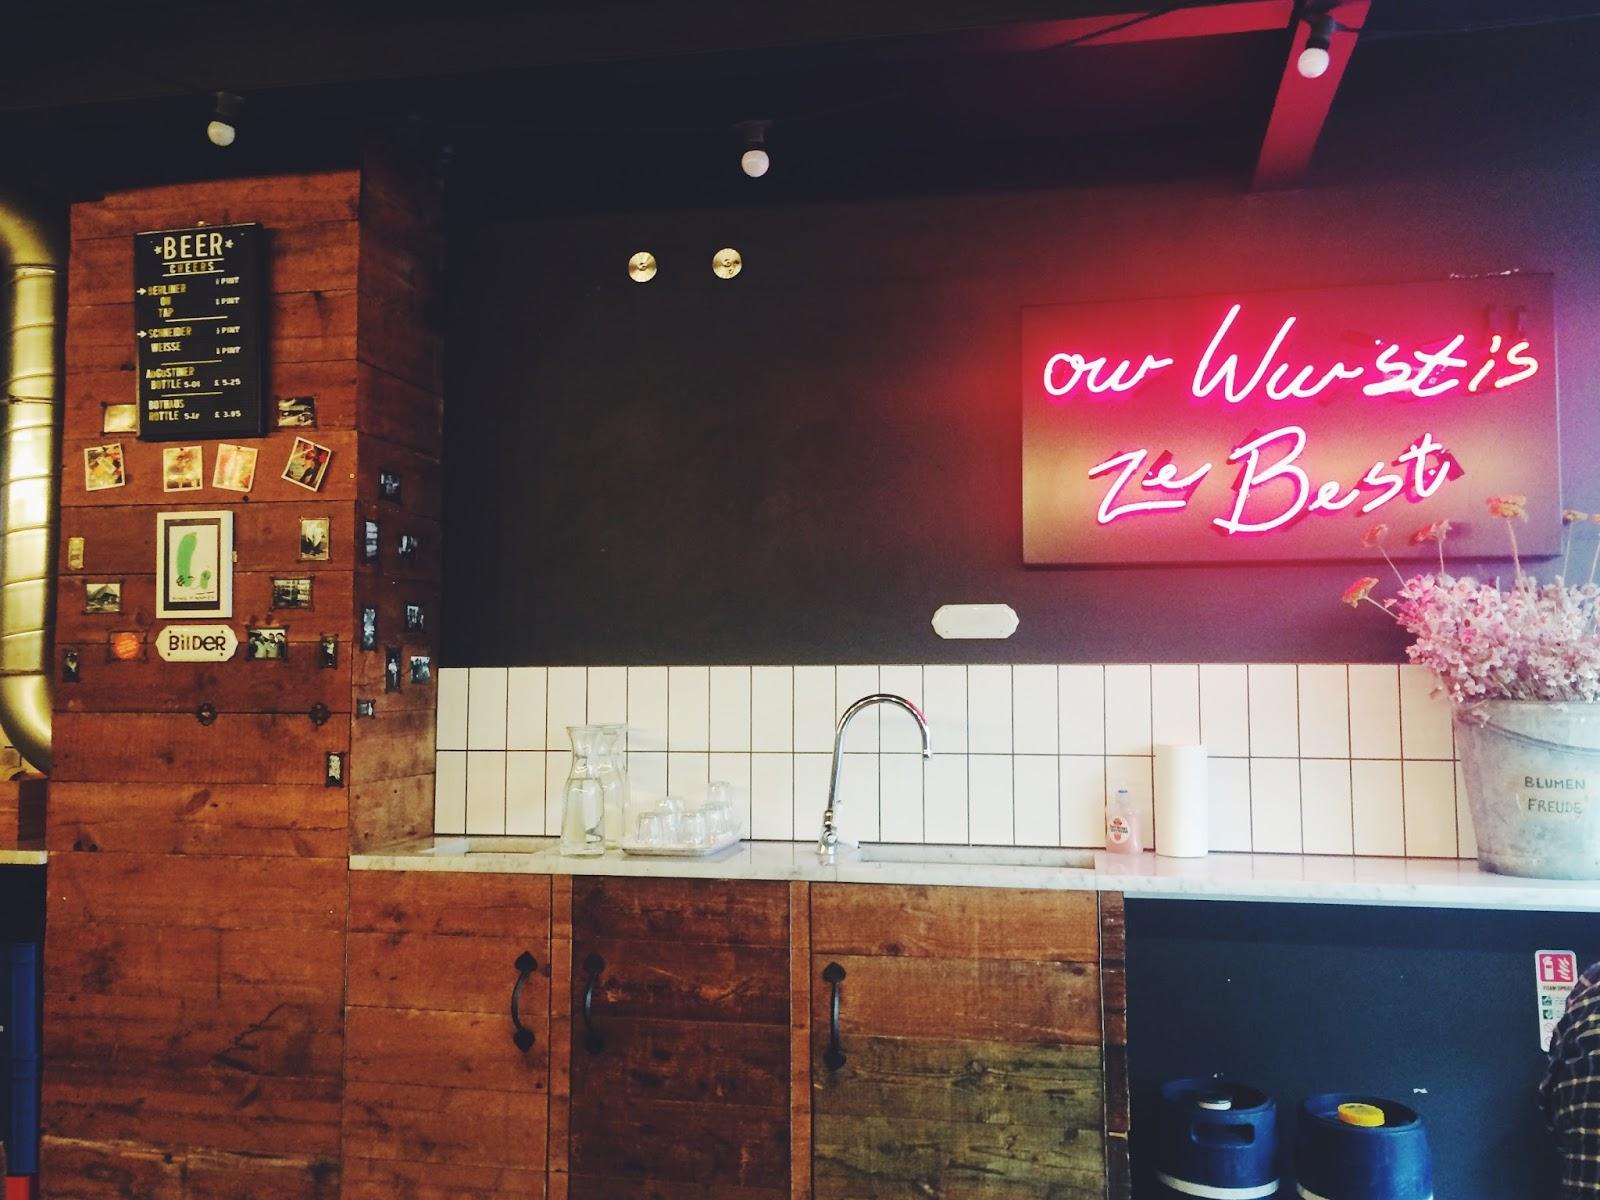 Herman ze German Soho review, places to eat Soho, food bloggers, UK food blog, Dalry Rose Blog